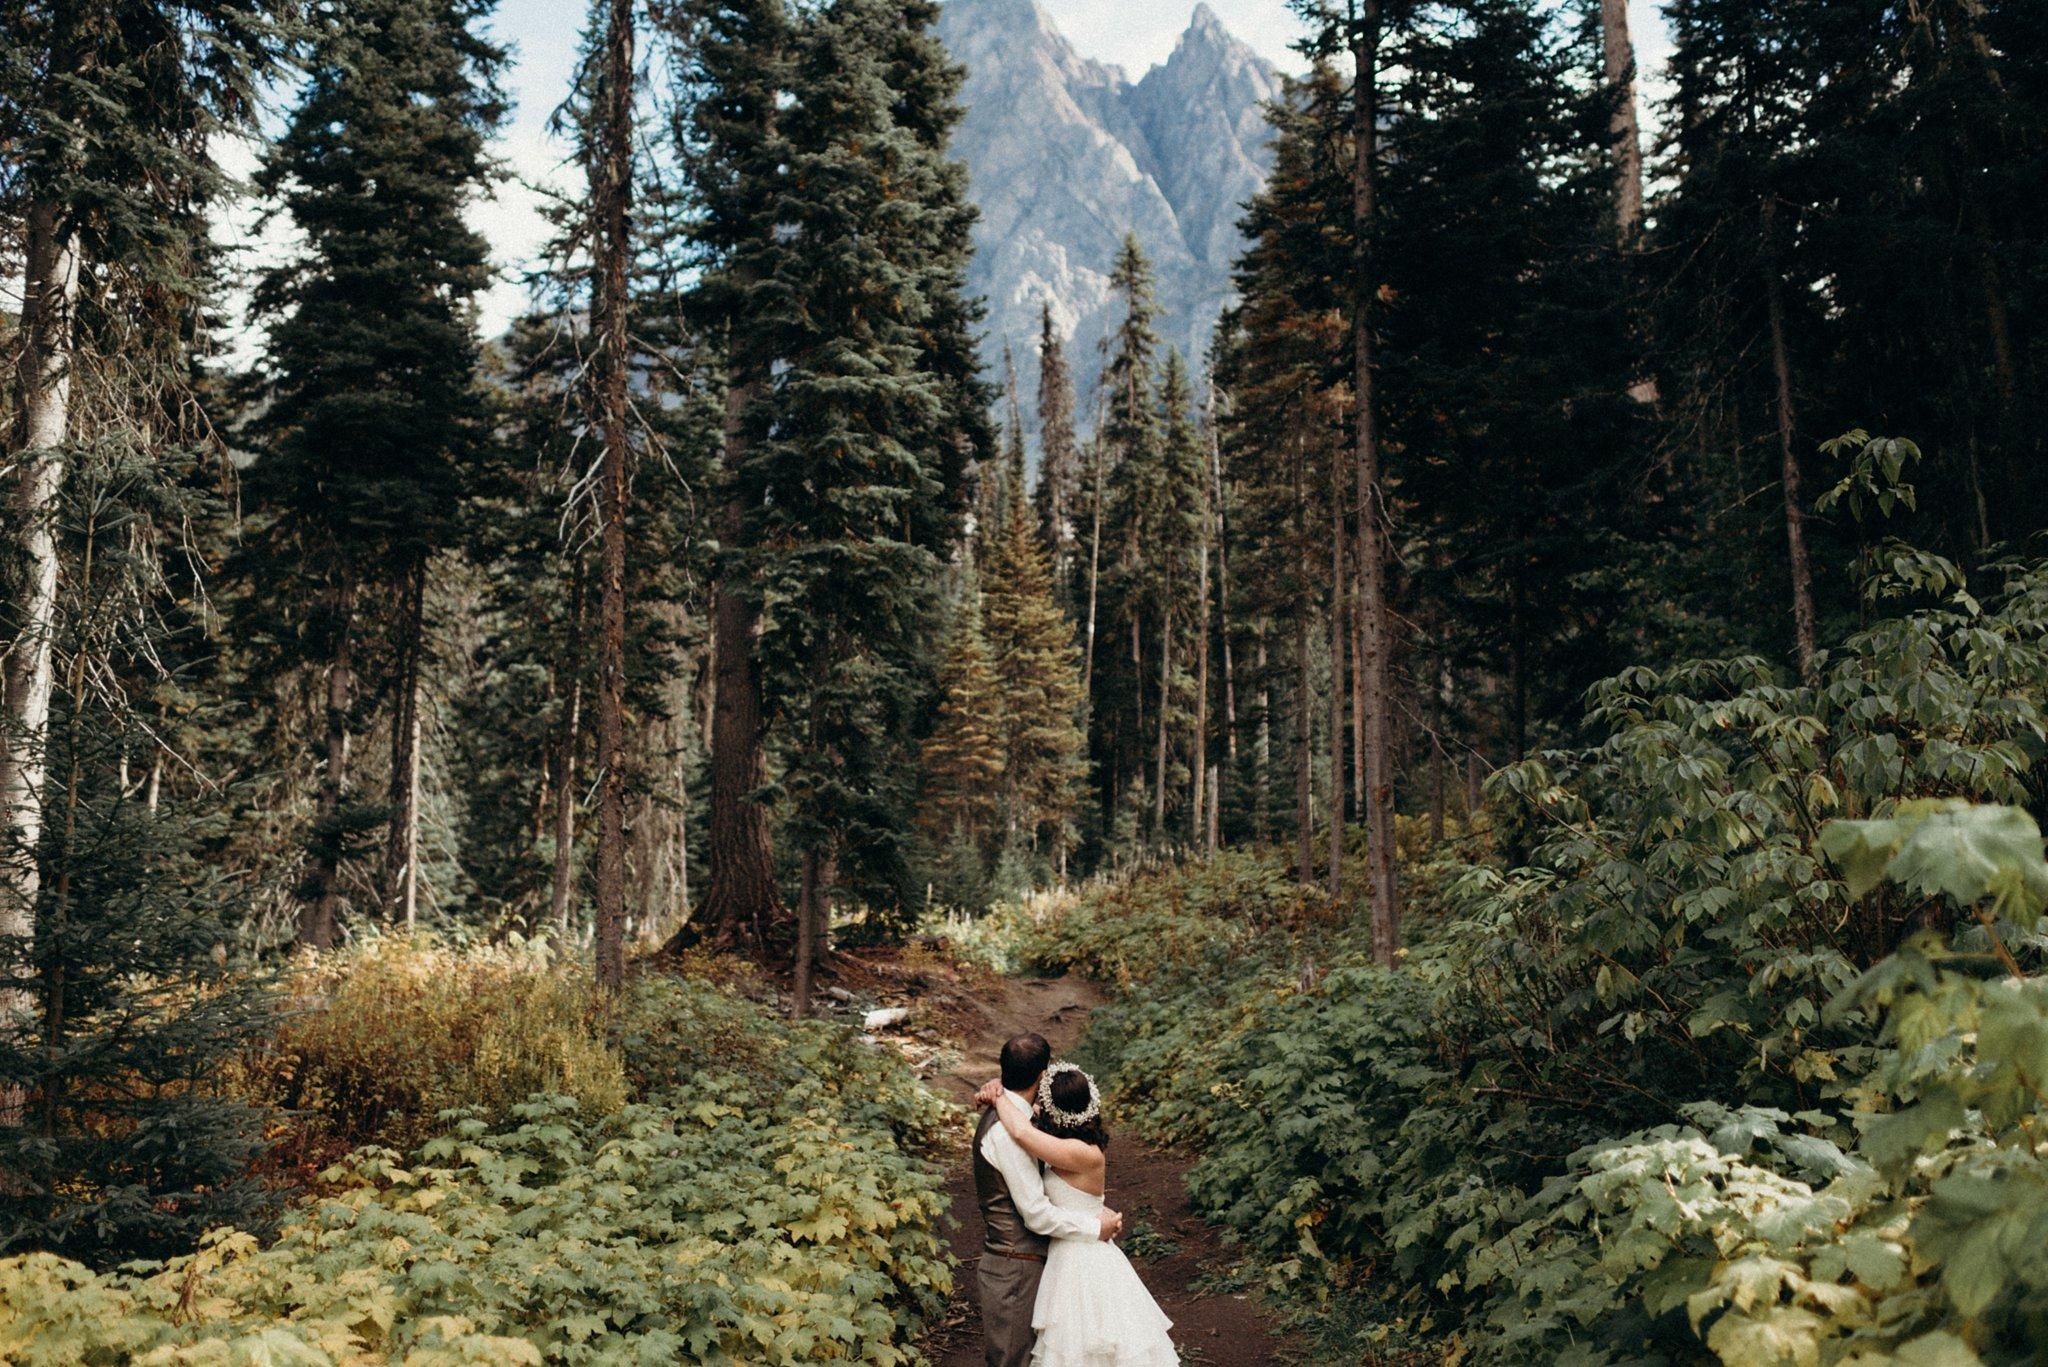 kaihla_tonai_intimate_wedding_elopement_photographer_6886.jpg